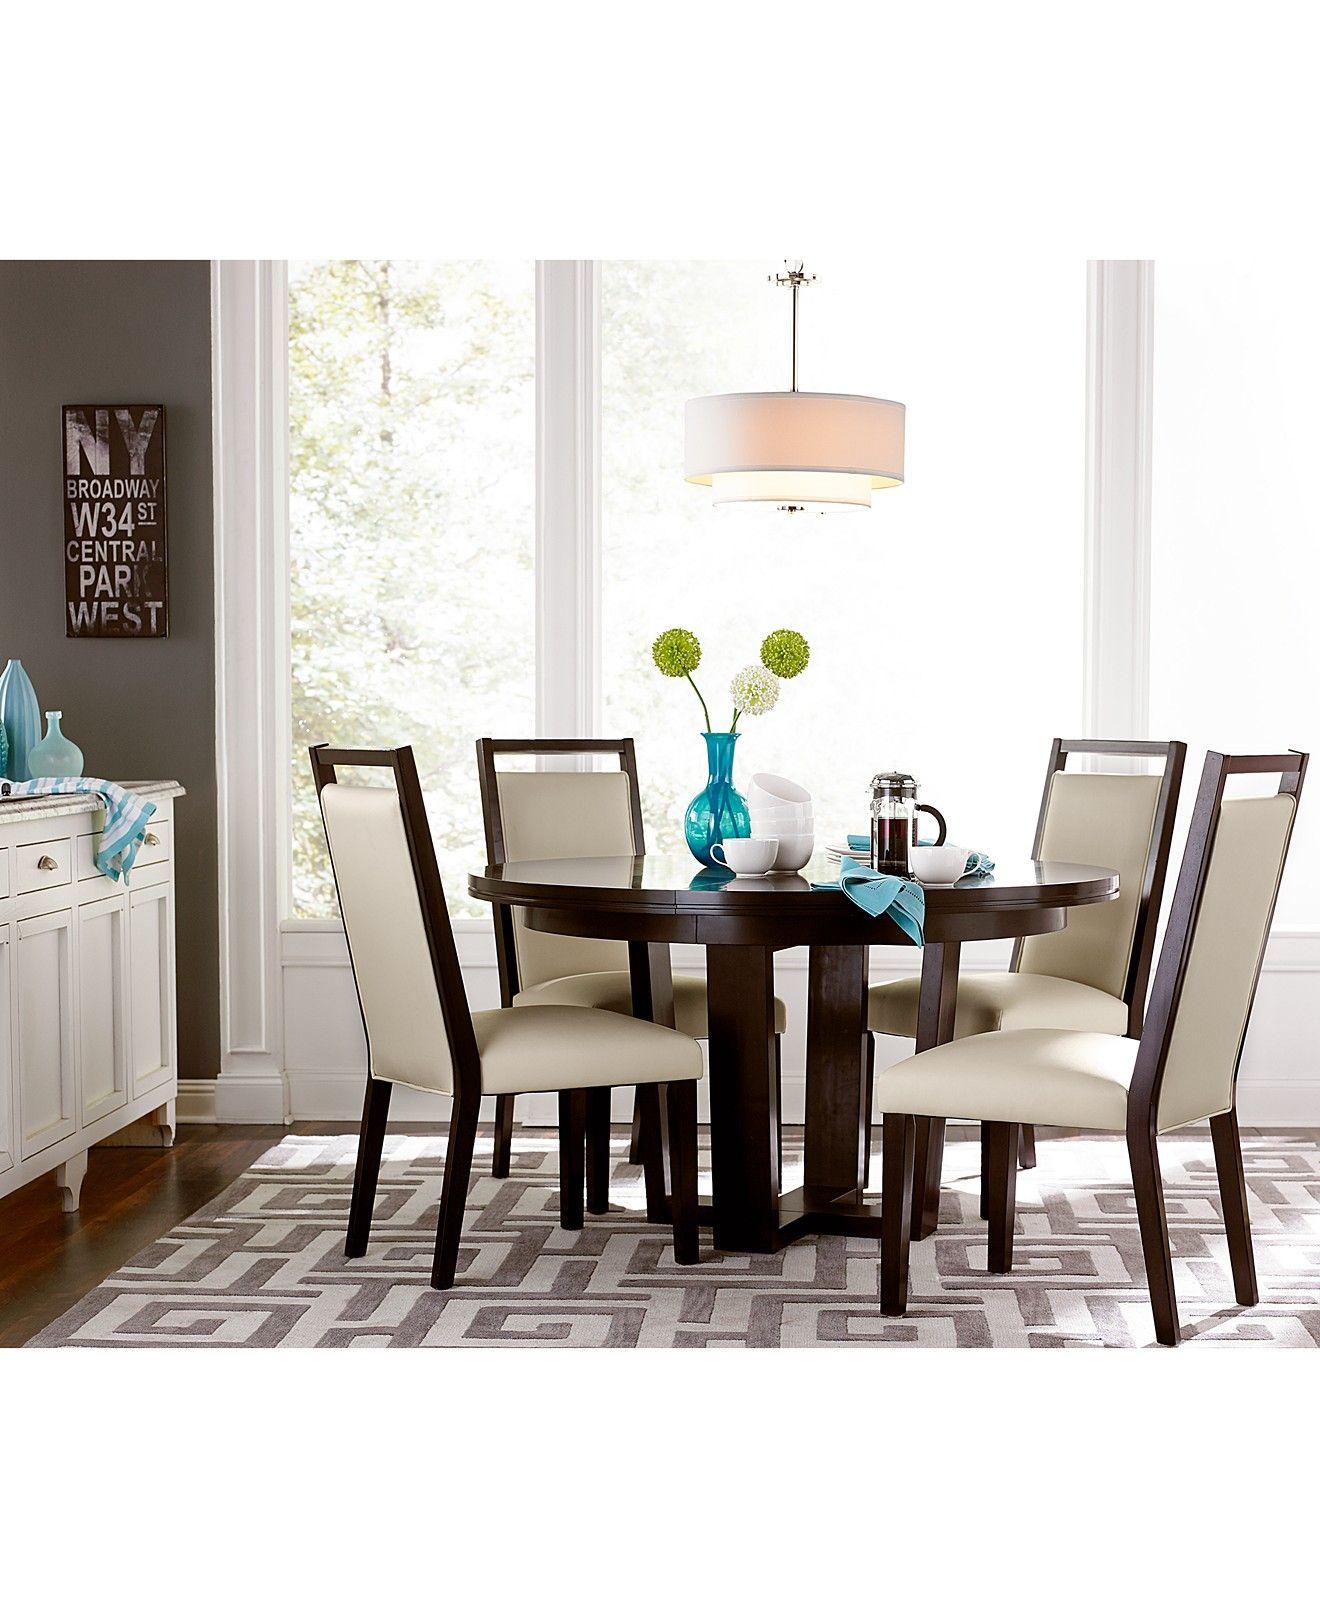 Macys Com Furniture: Belaire Round Dining Colleciton